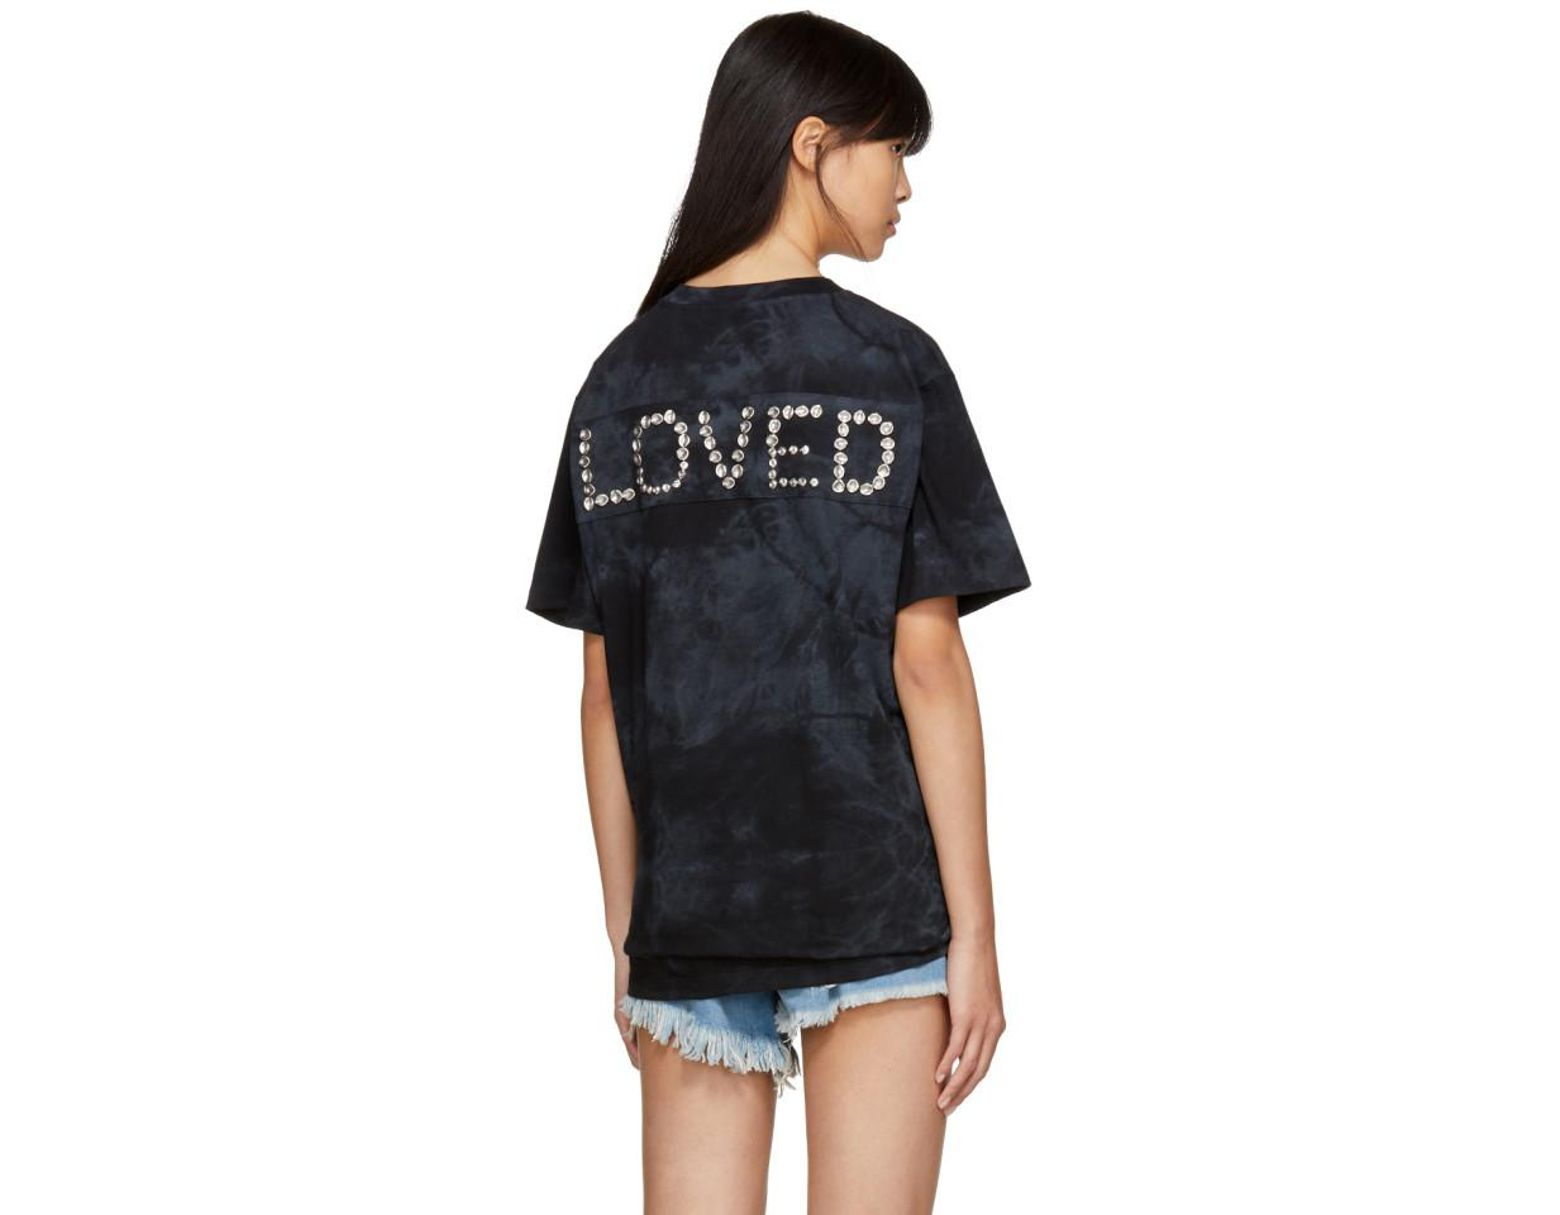 2bb4b65dd Gucci Black 'loved' 'vintage ' T-shirt in Black - Lyst